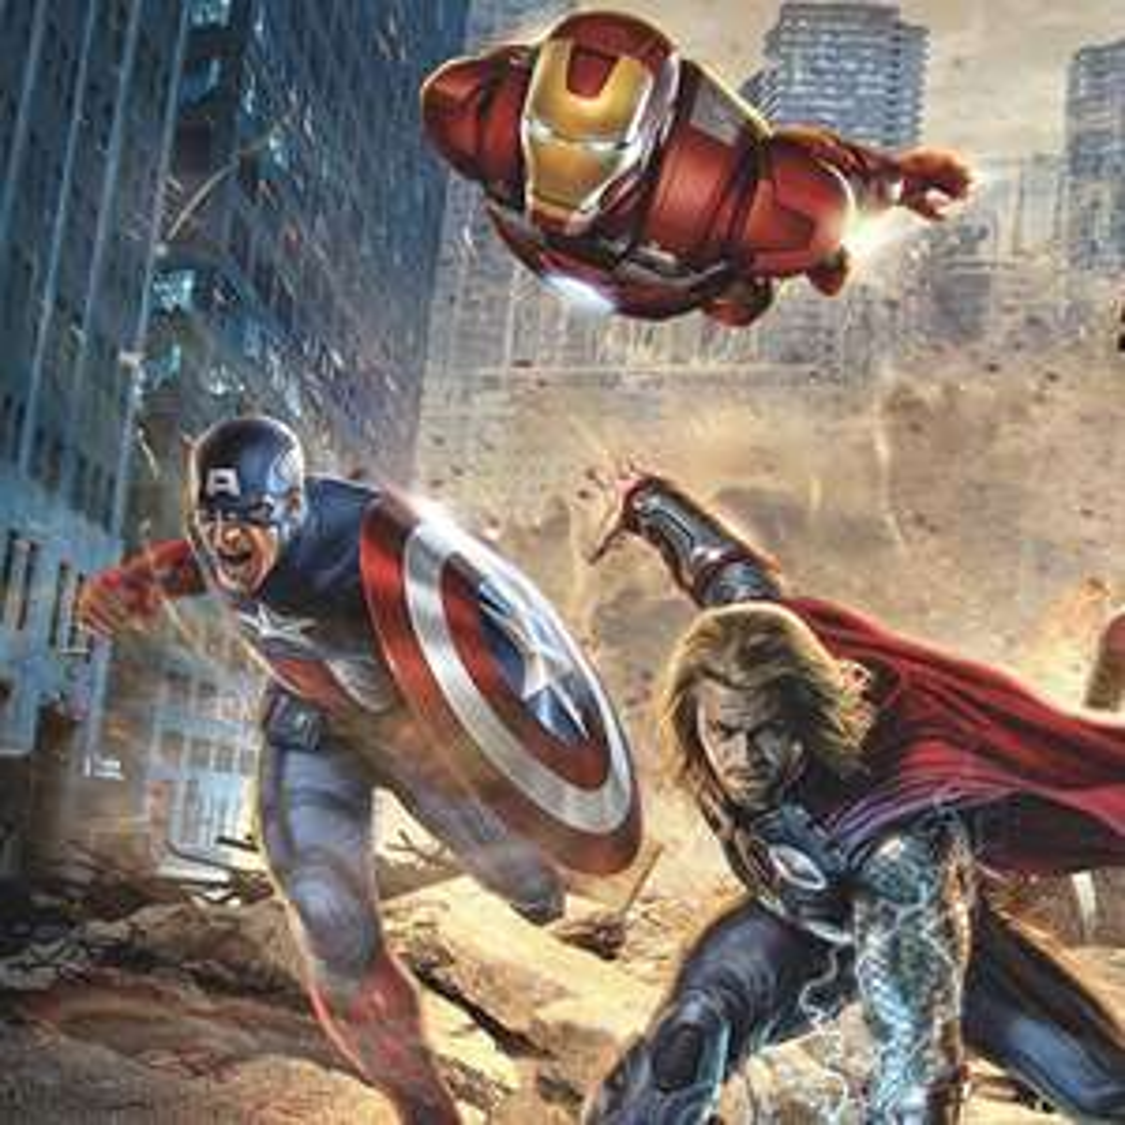 Marvel Vlies Fototapeten - Bestpreis z.B. AVENGERS VINTAGE COMIC - 400 x 250 cm - Infinity War - 046-DVD4